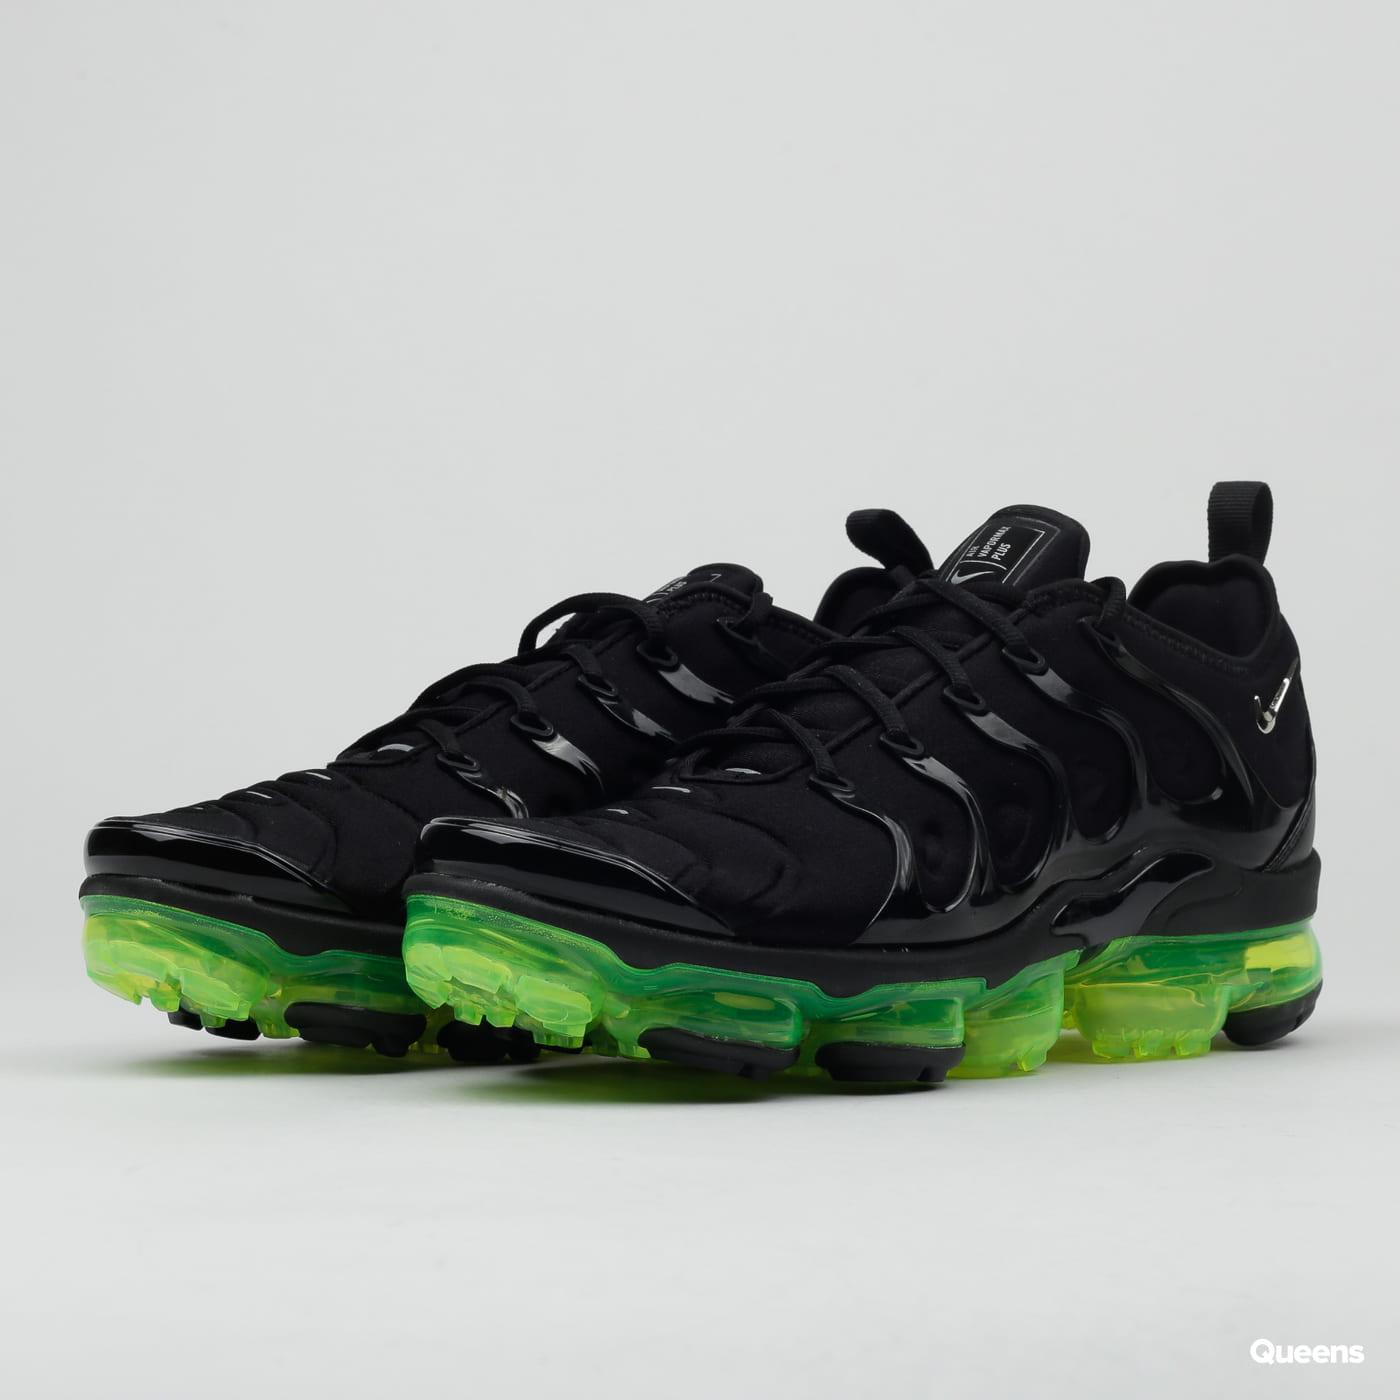 pretty nice c2b3d cacf7 Boty Nike Air Vapormax Plus (924453-015) – Queens 💚